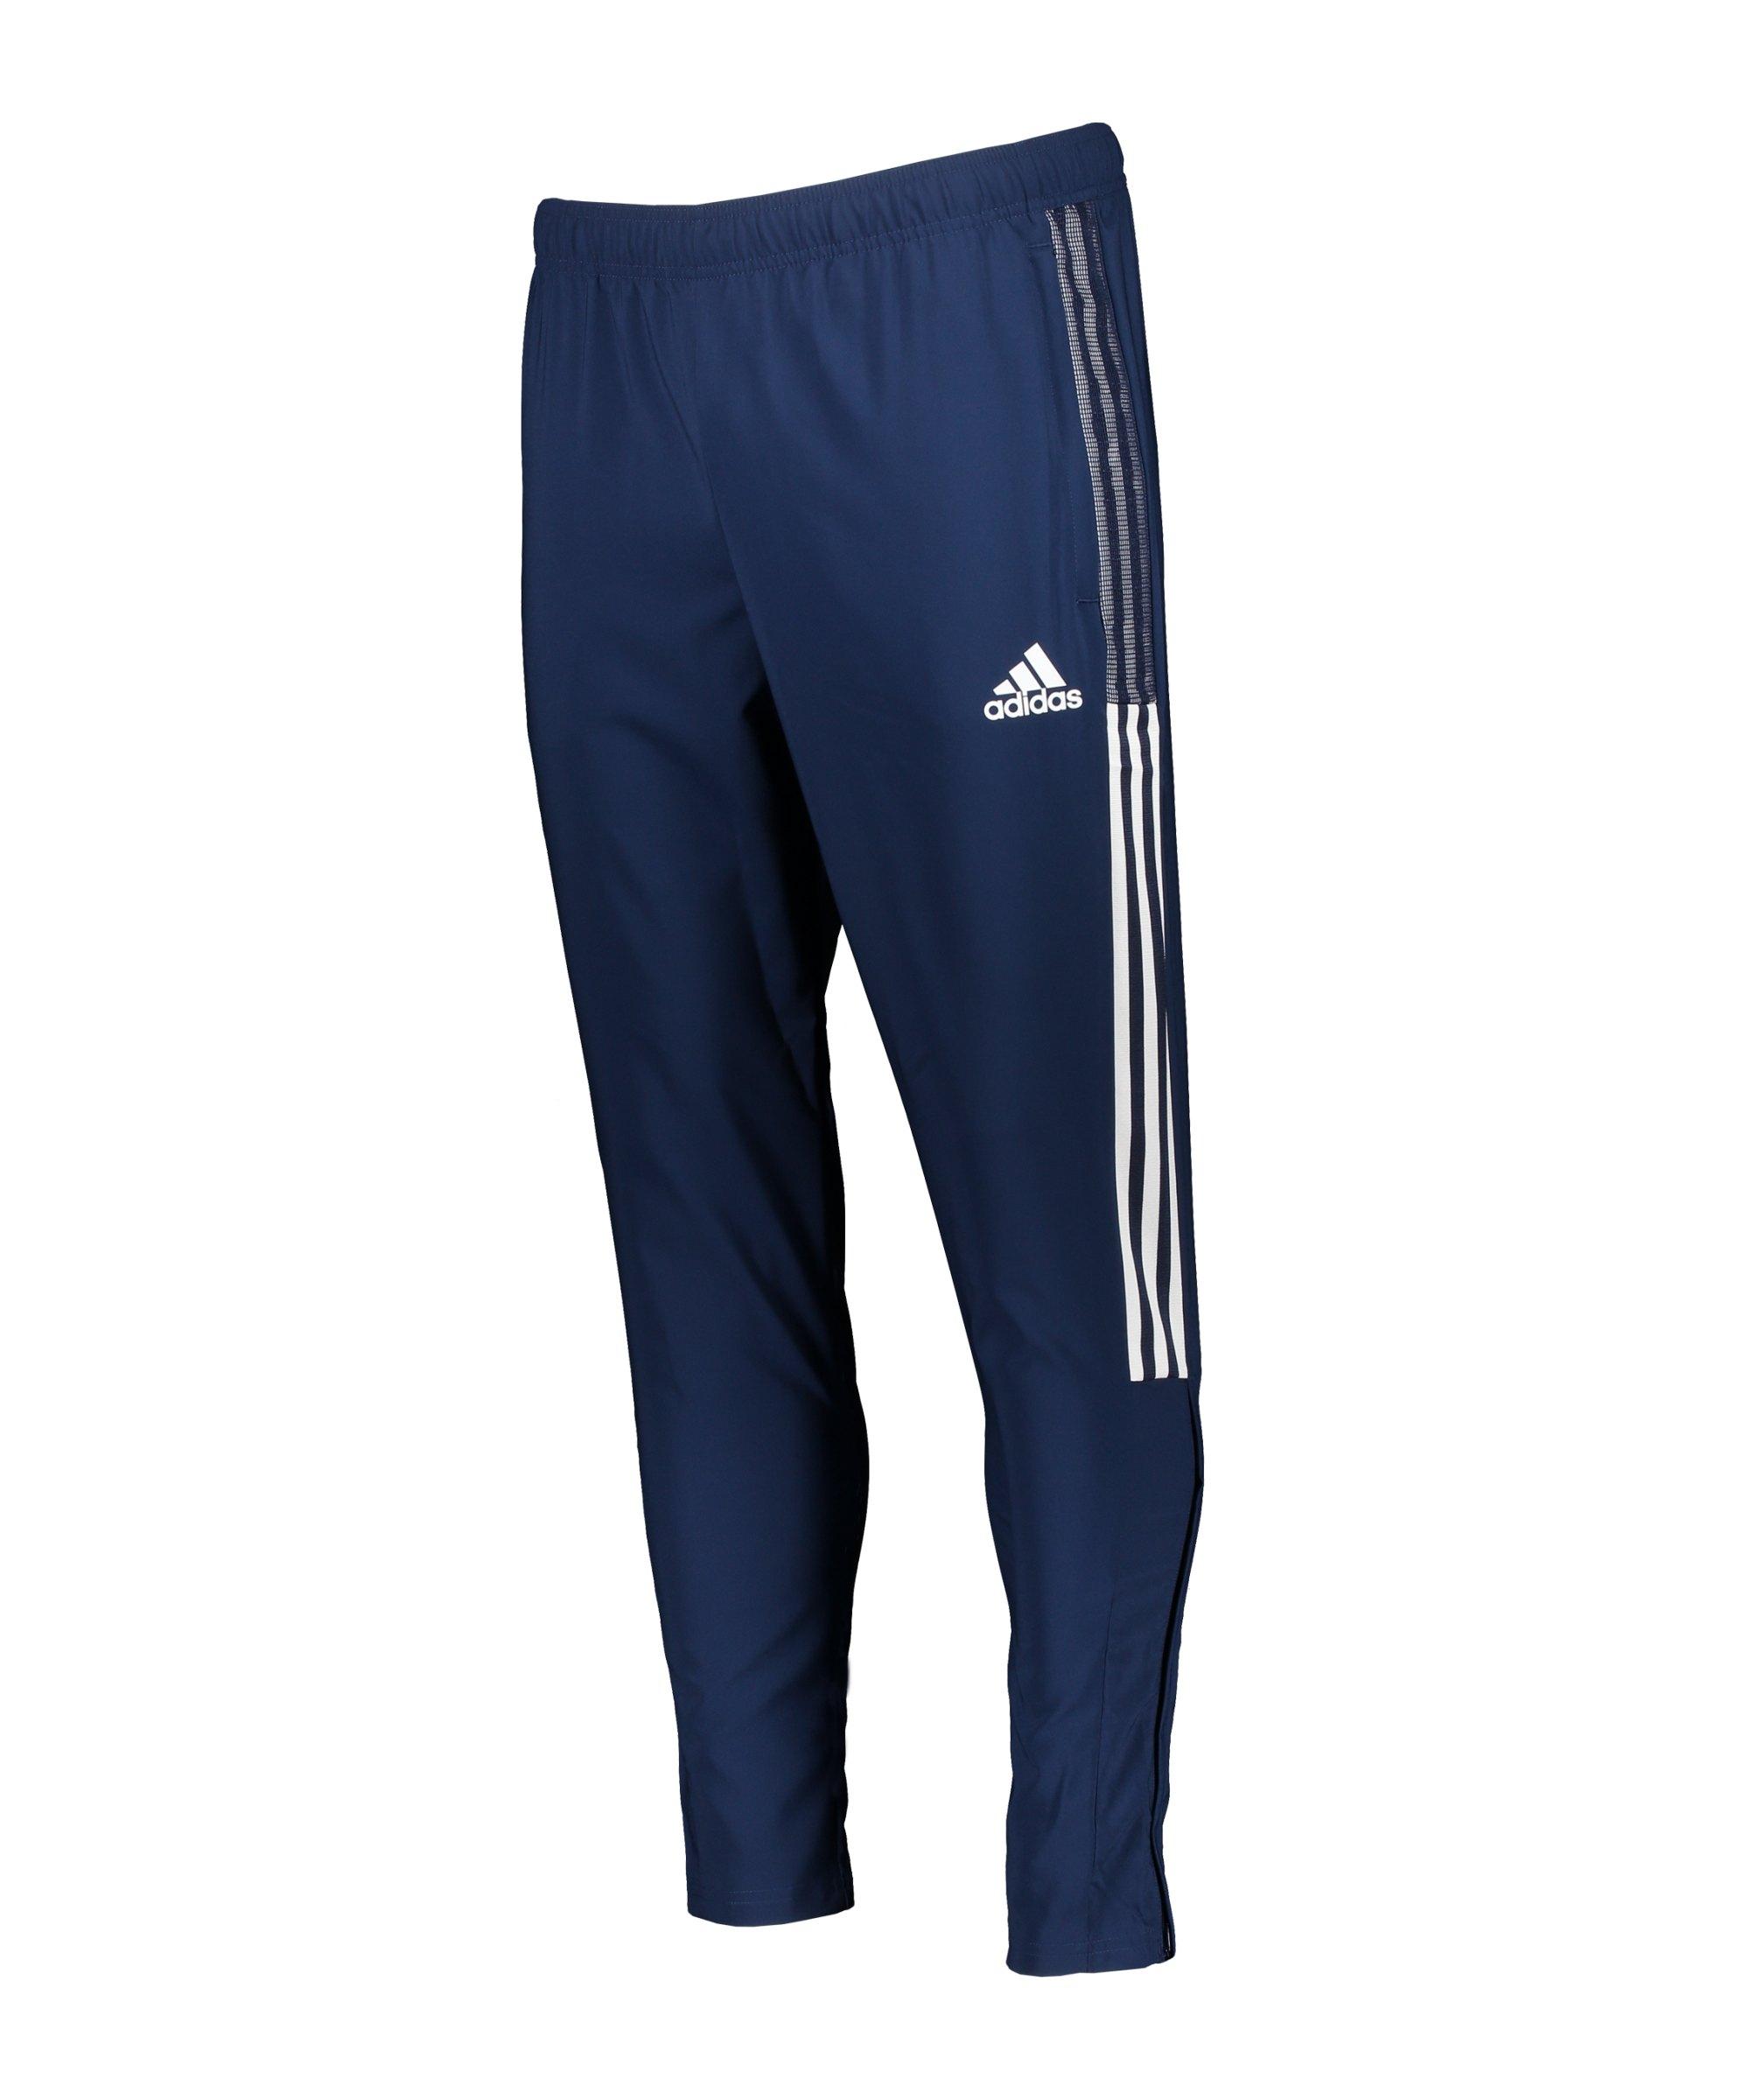 adidas Tiro 21 Woven Trainingshose Dunkelblau - blau